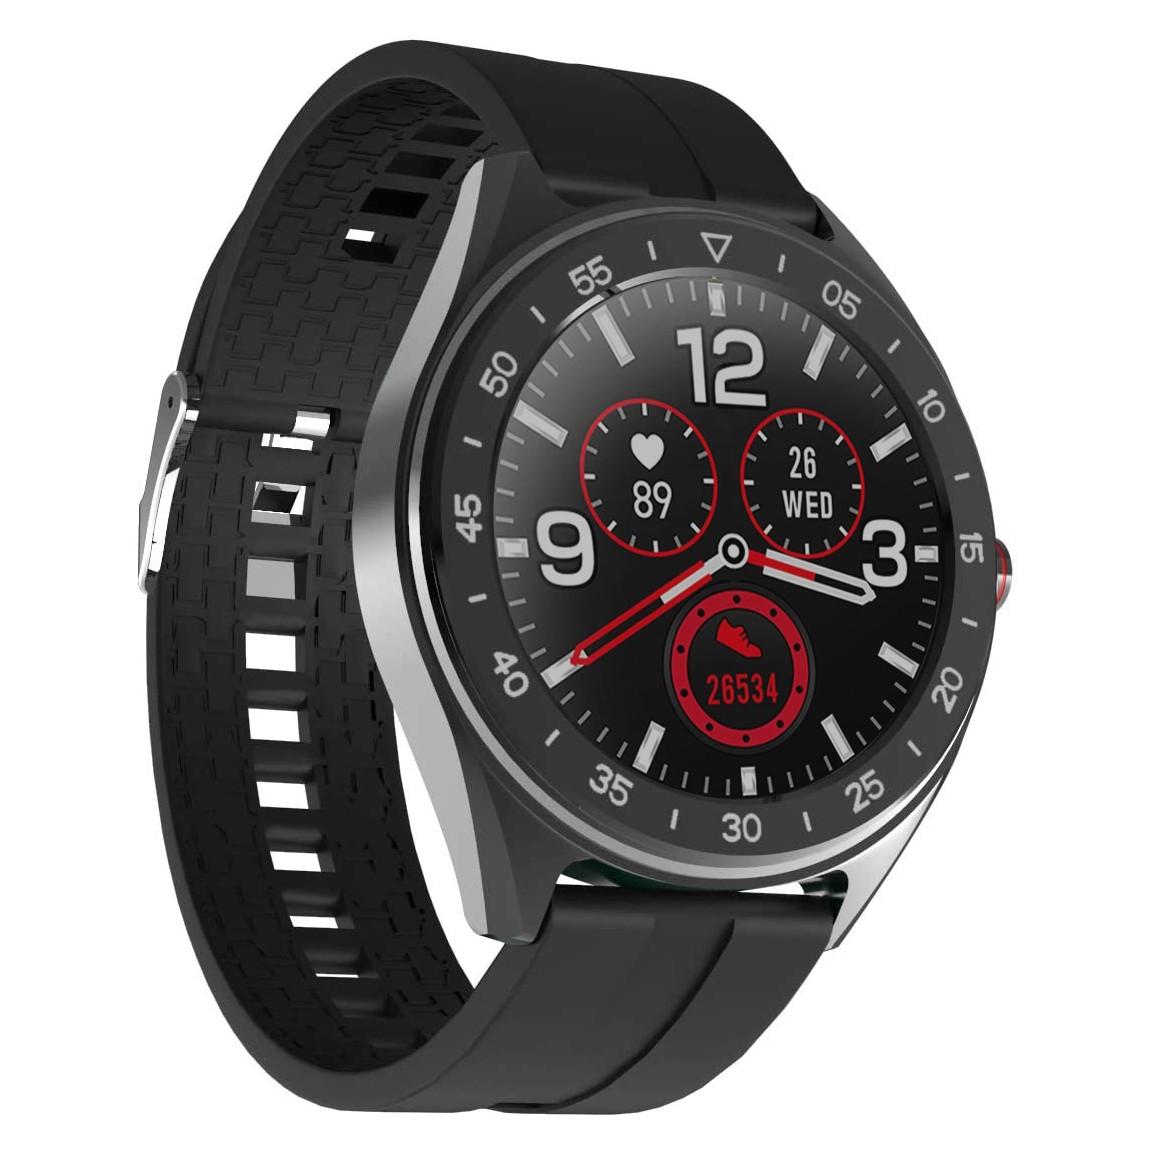 "Smartwatch Lenovo R1 IP68 280mAh V4.0 All Touch 1.3"" Μαύρο Silicon Band με Επιπλέον λουράκι και προσόψεις"